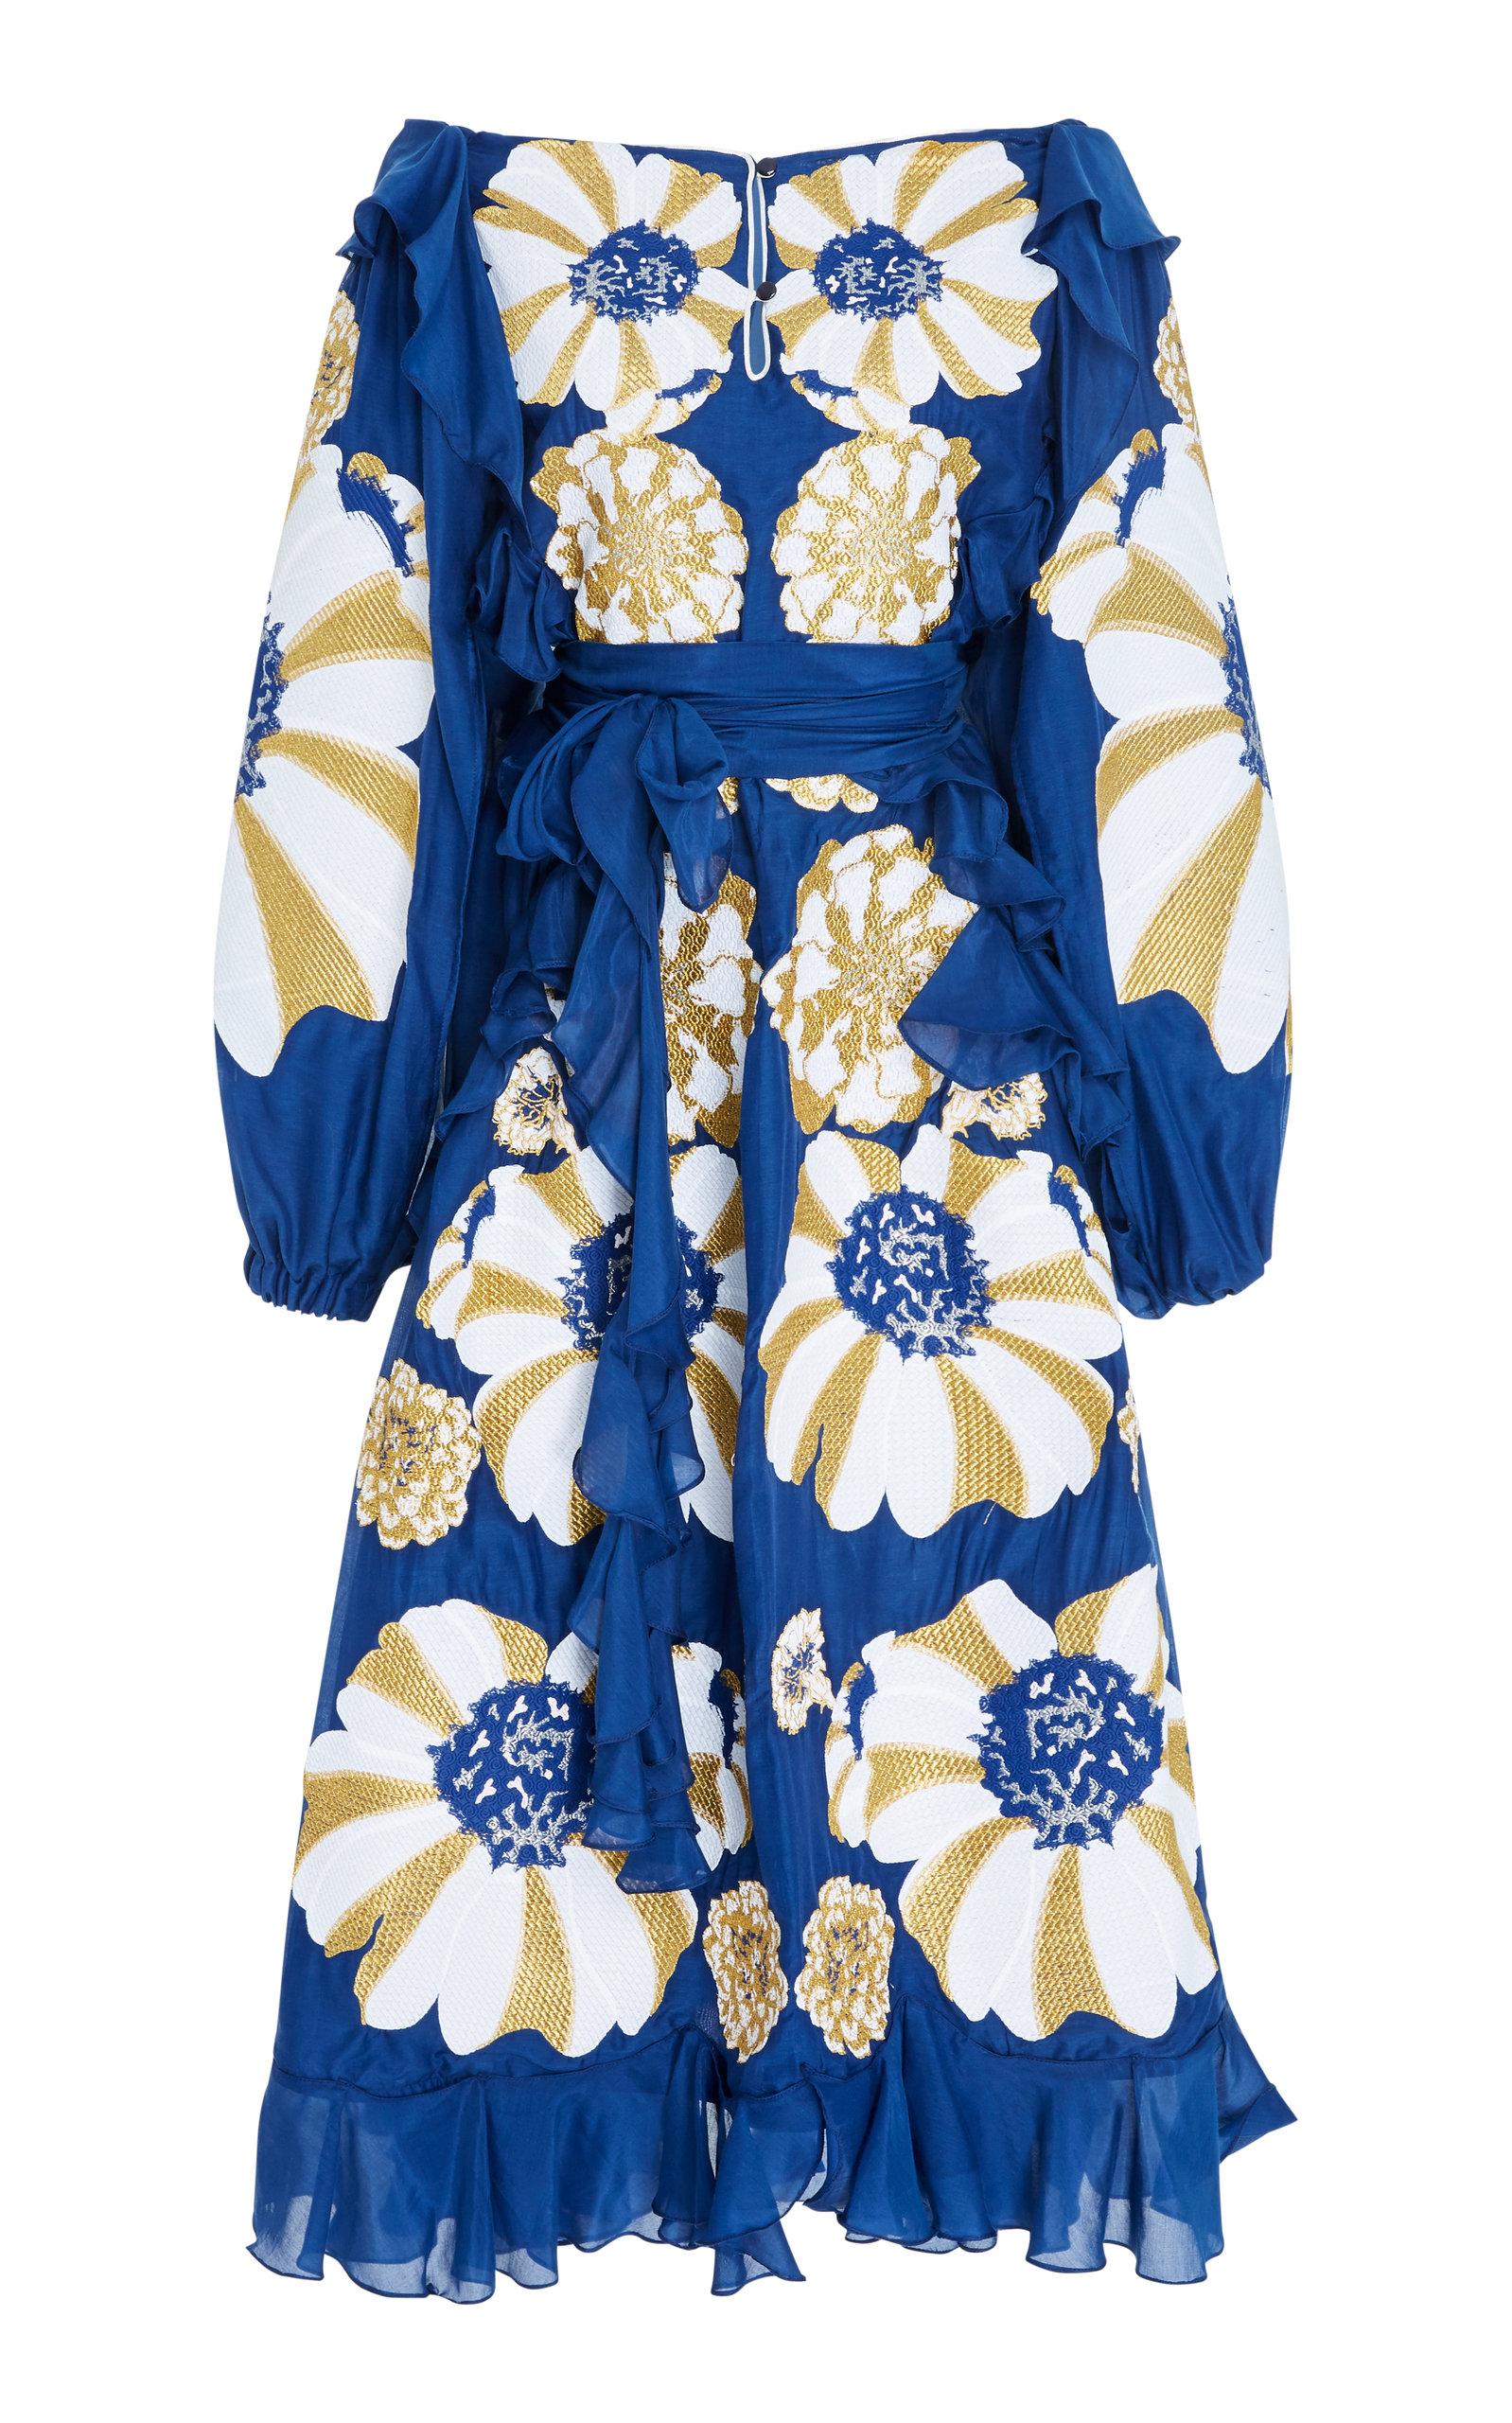 YULIYA MAGDYCH HYPNOZE EMBROIDERED COTTON DRESS